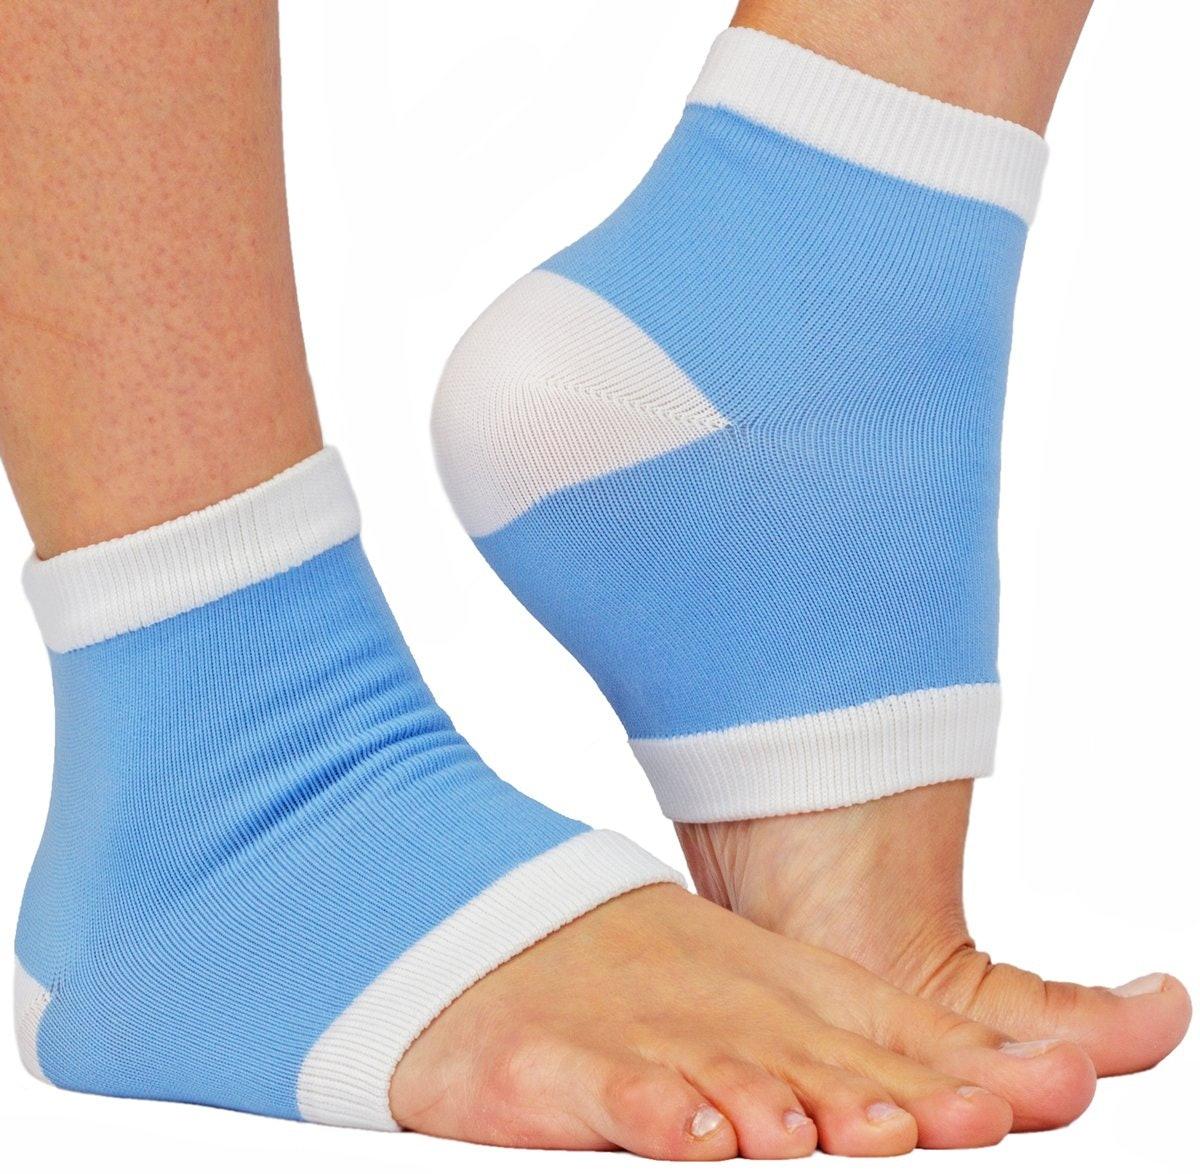 The 3 Best Foot Creams For Cracked Heels